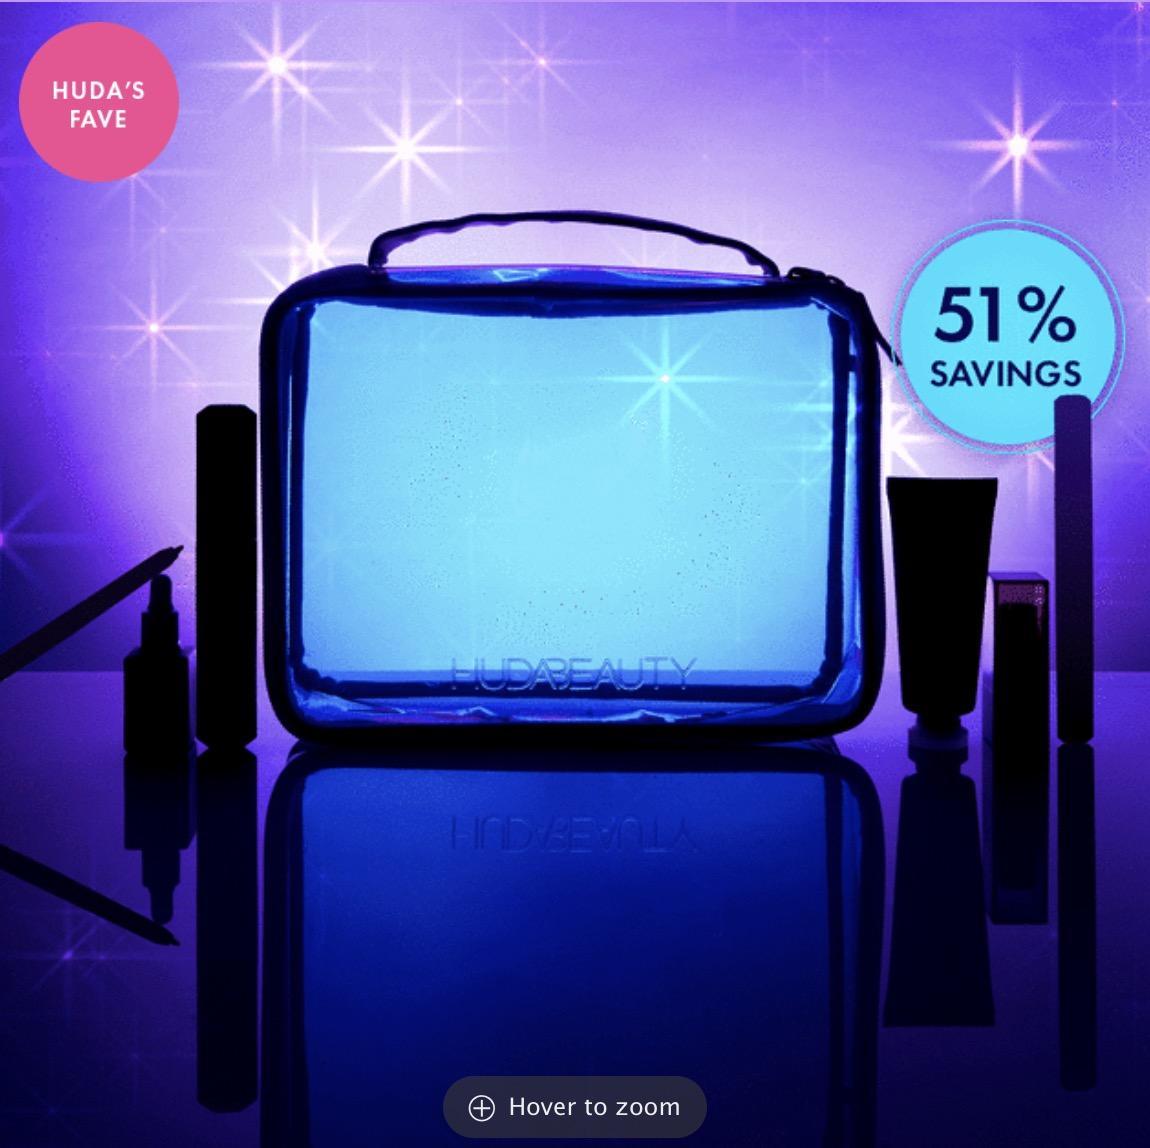 HUDA Beauty Surprise Mystery Birthday Bag – On Sale Now